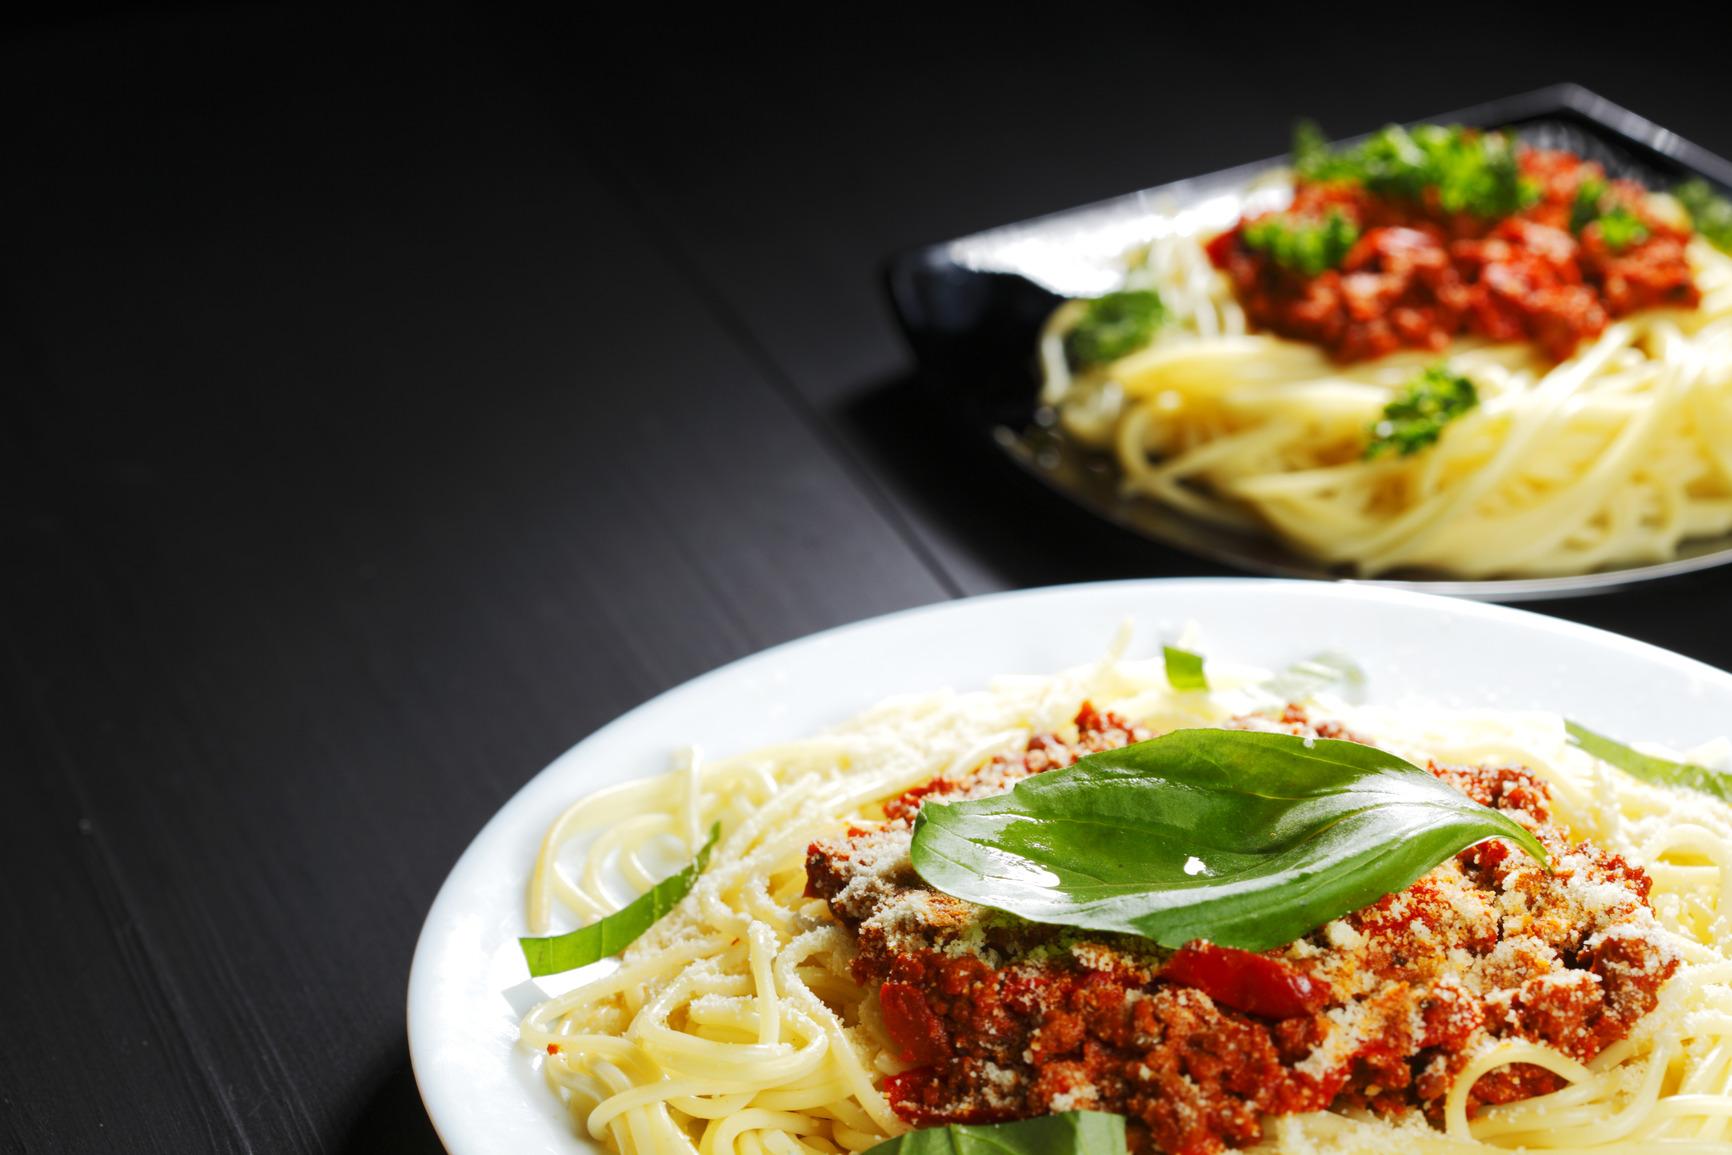 photodune-4874661-spaghetti-bolognese-with-basil-m1